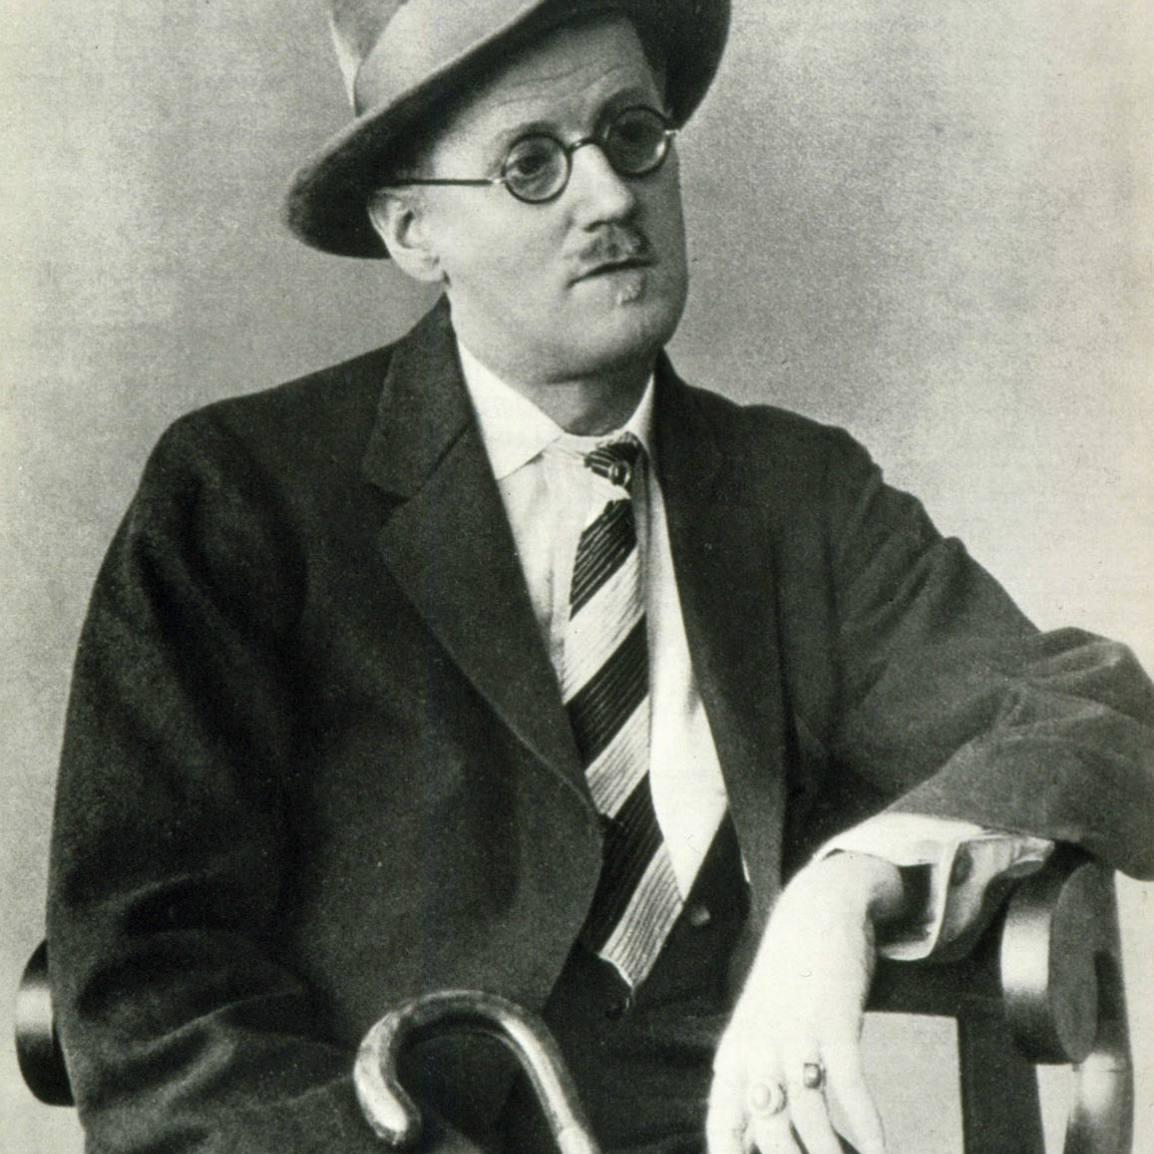 Portrait of Irish writer James Joyce